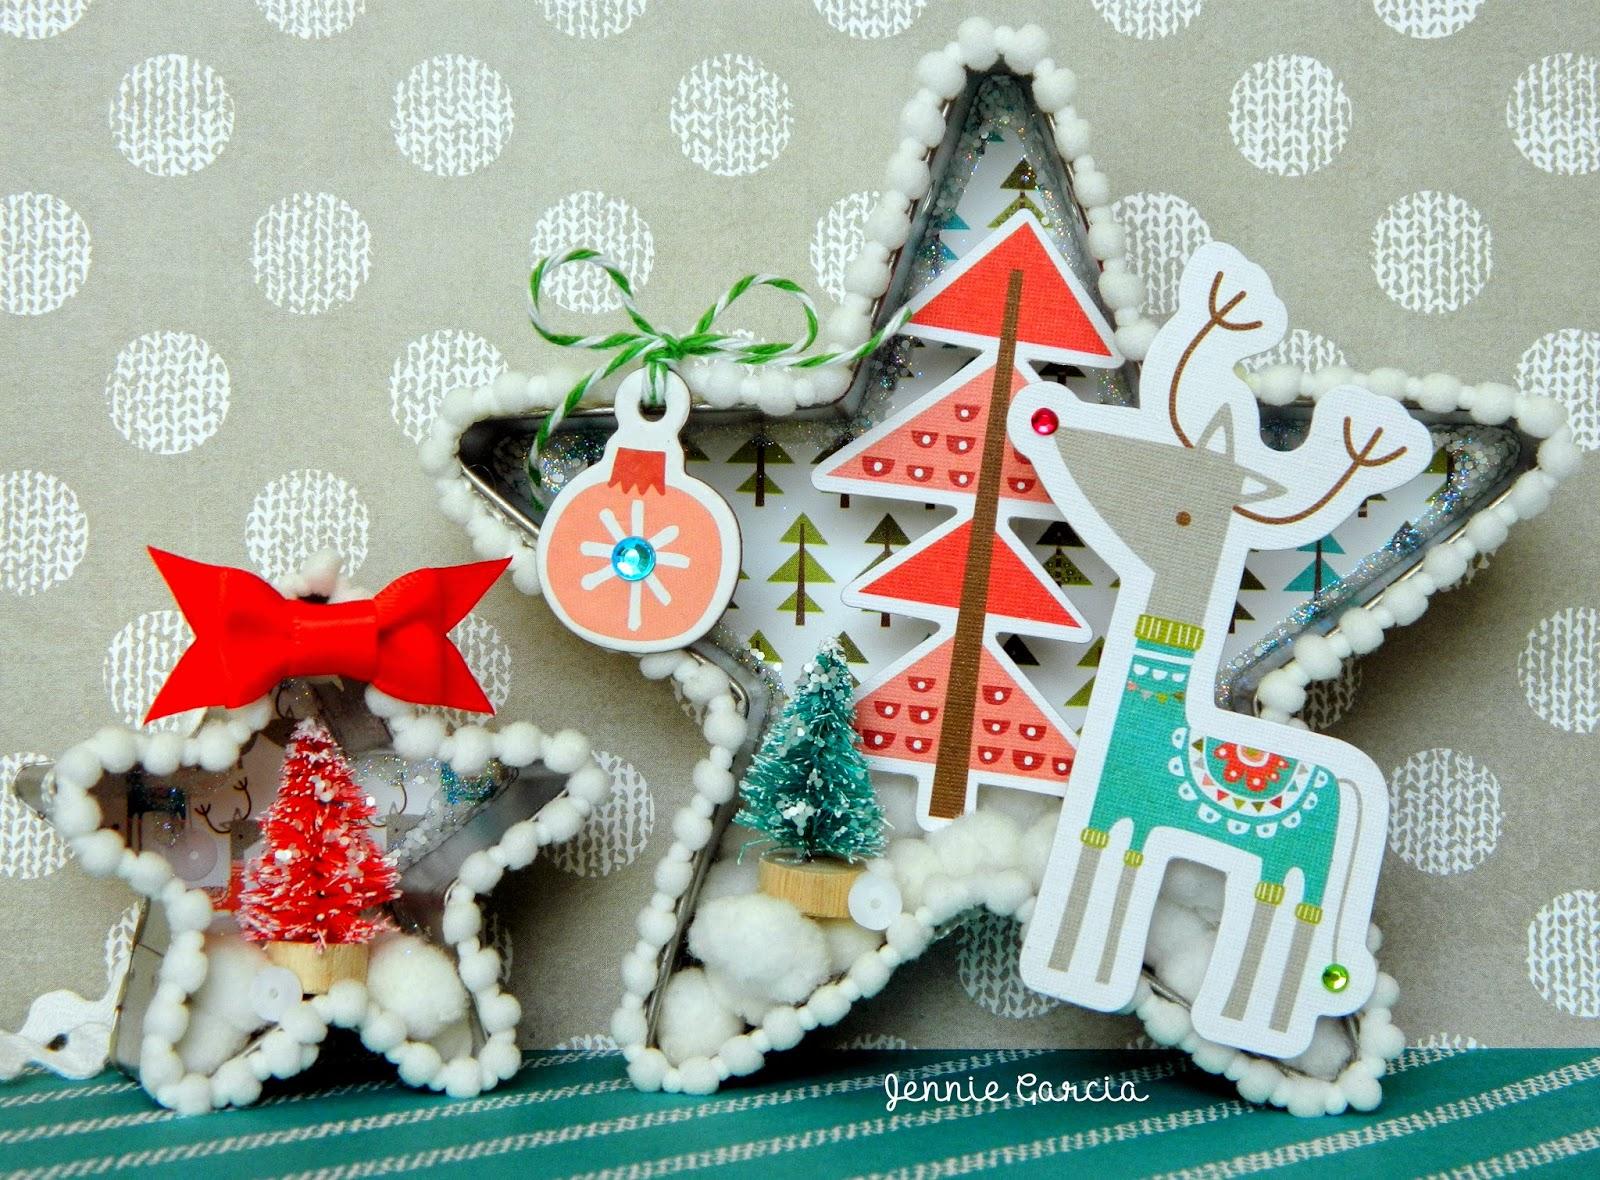 Christmas Ornaments by Jennie Garcia